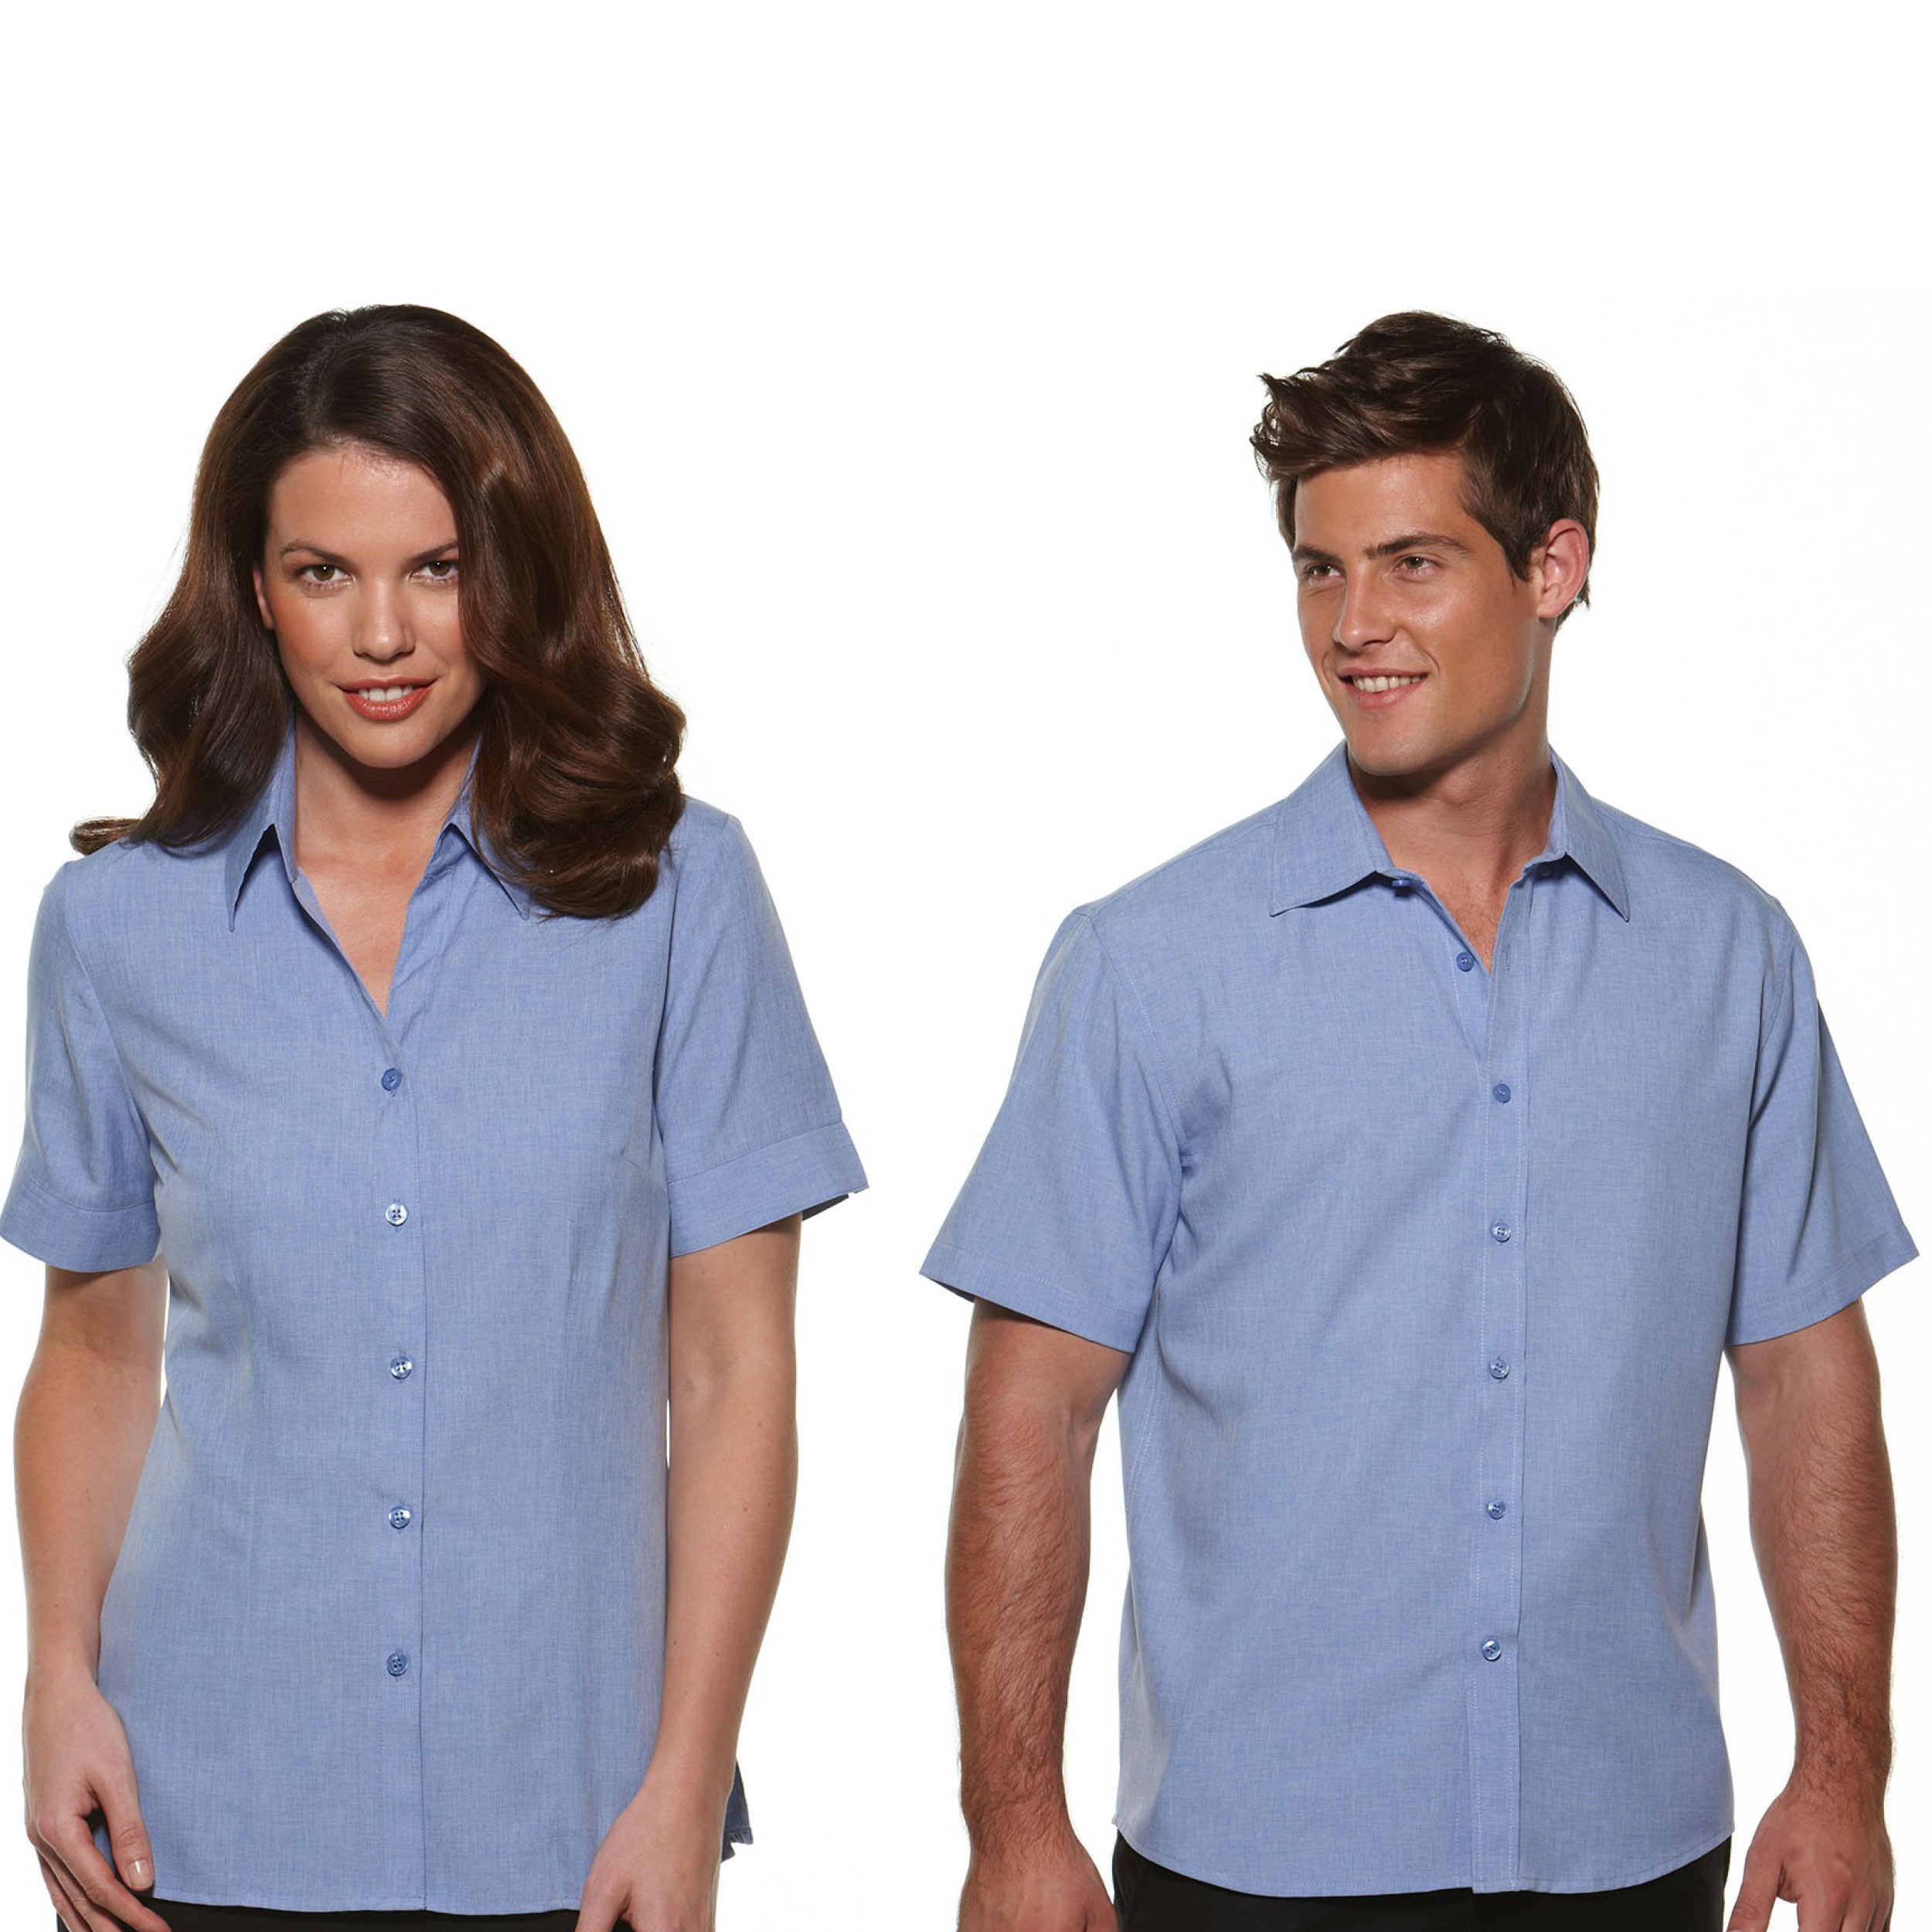 Climate Smart Shirts